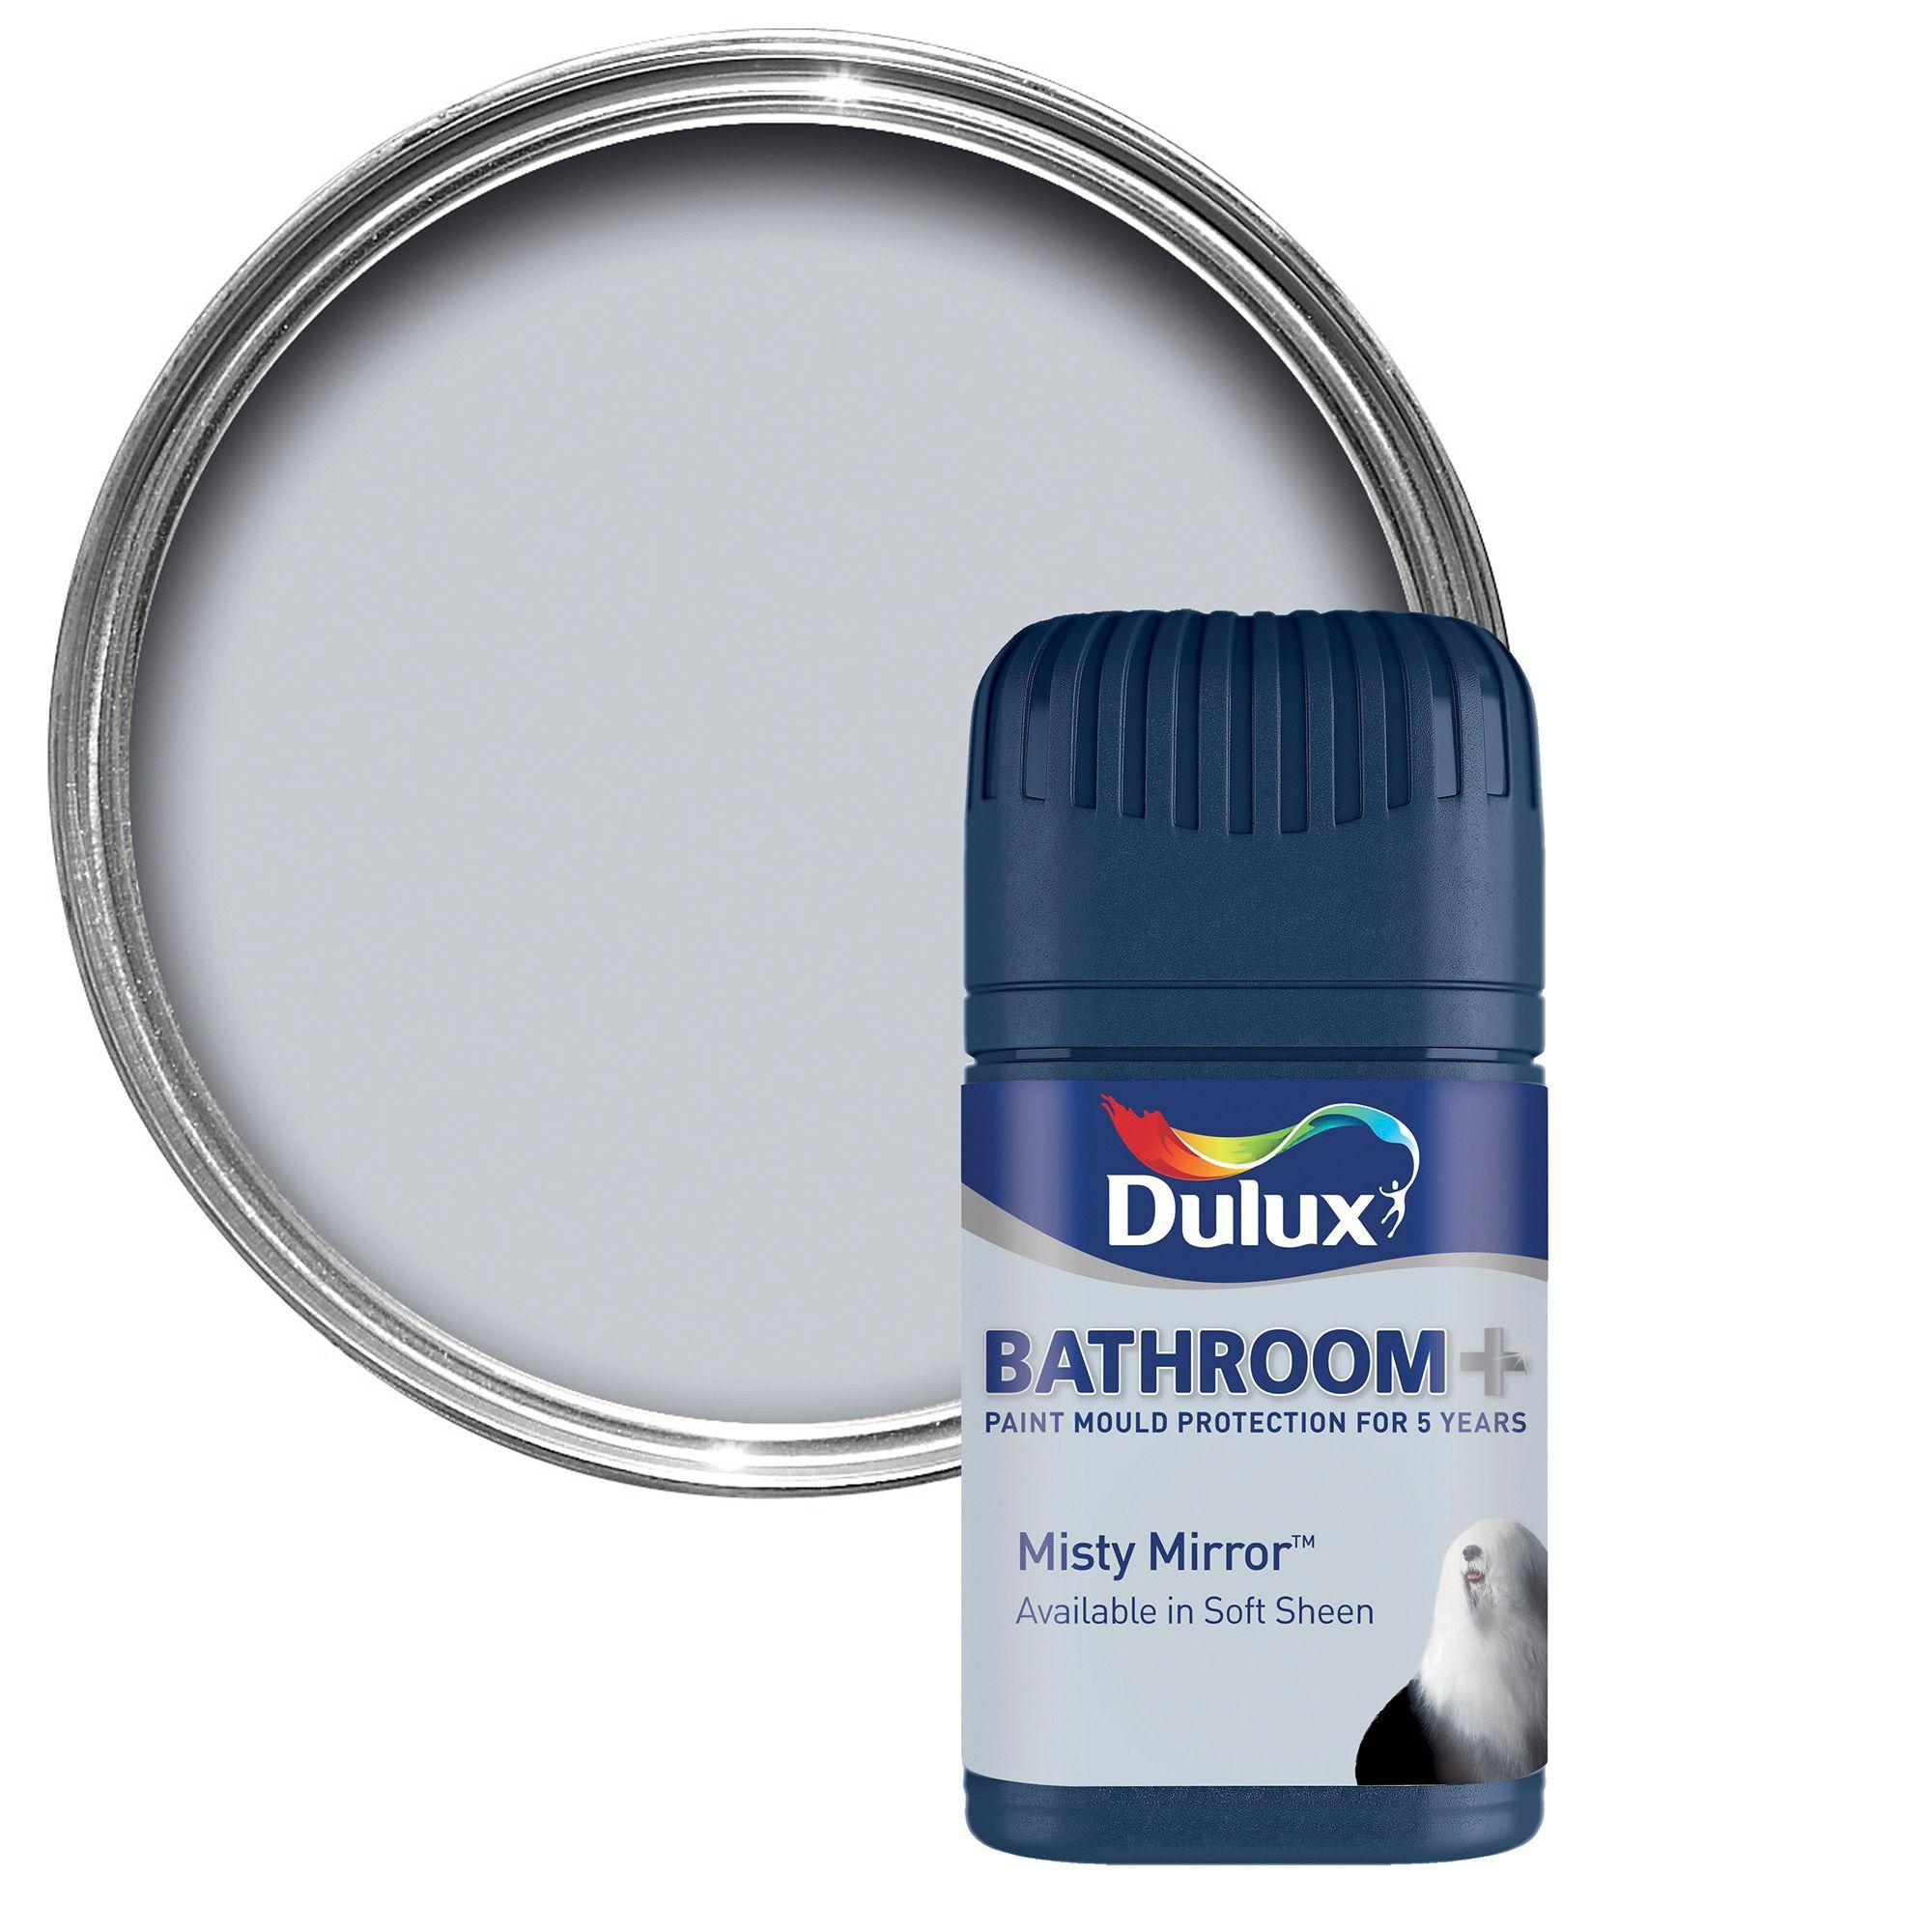 Dulux Bathroom+ Misty Mirror Soft Sheen Emulsion Paint 0.05L Tester Pot